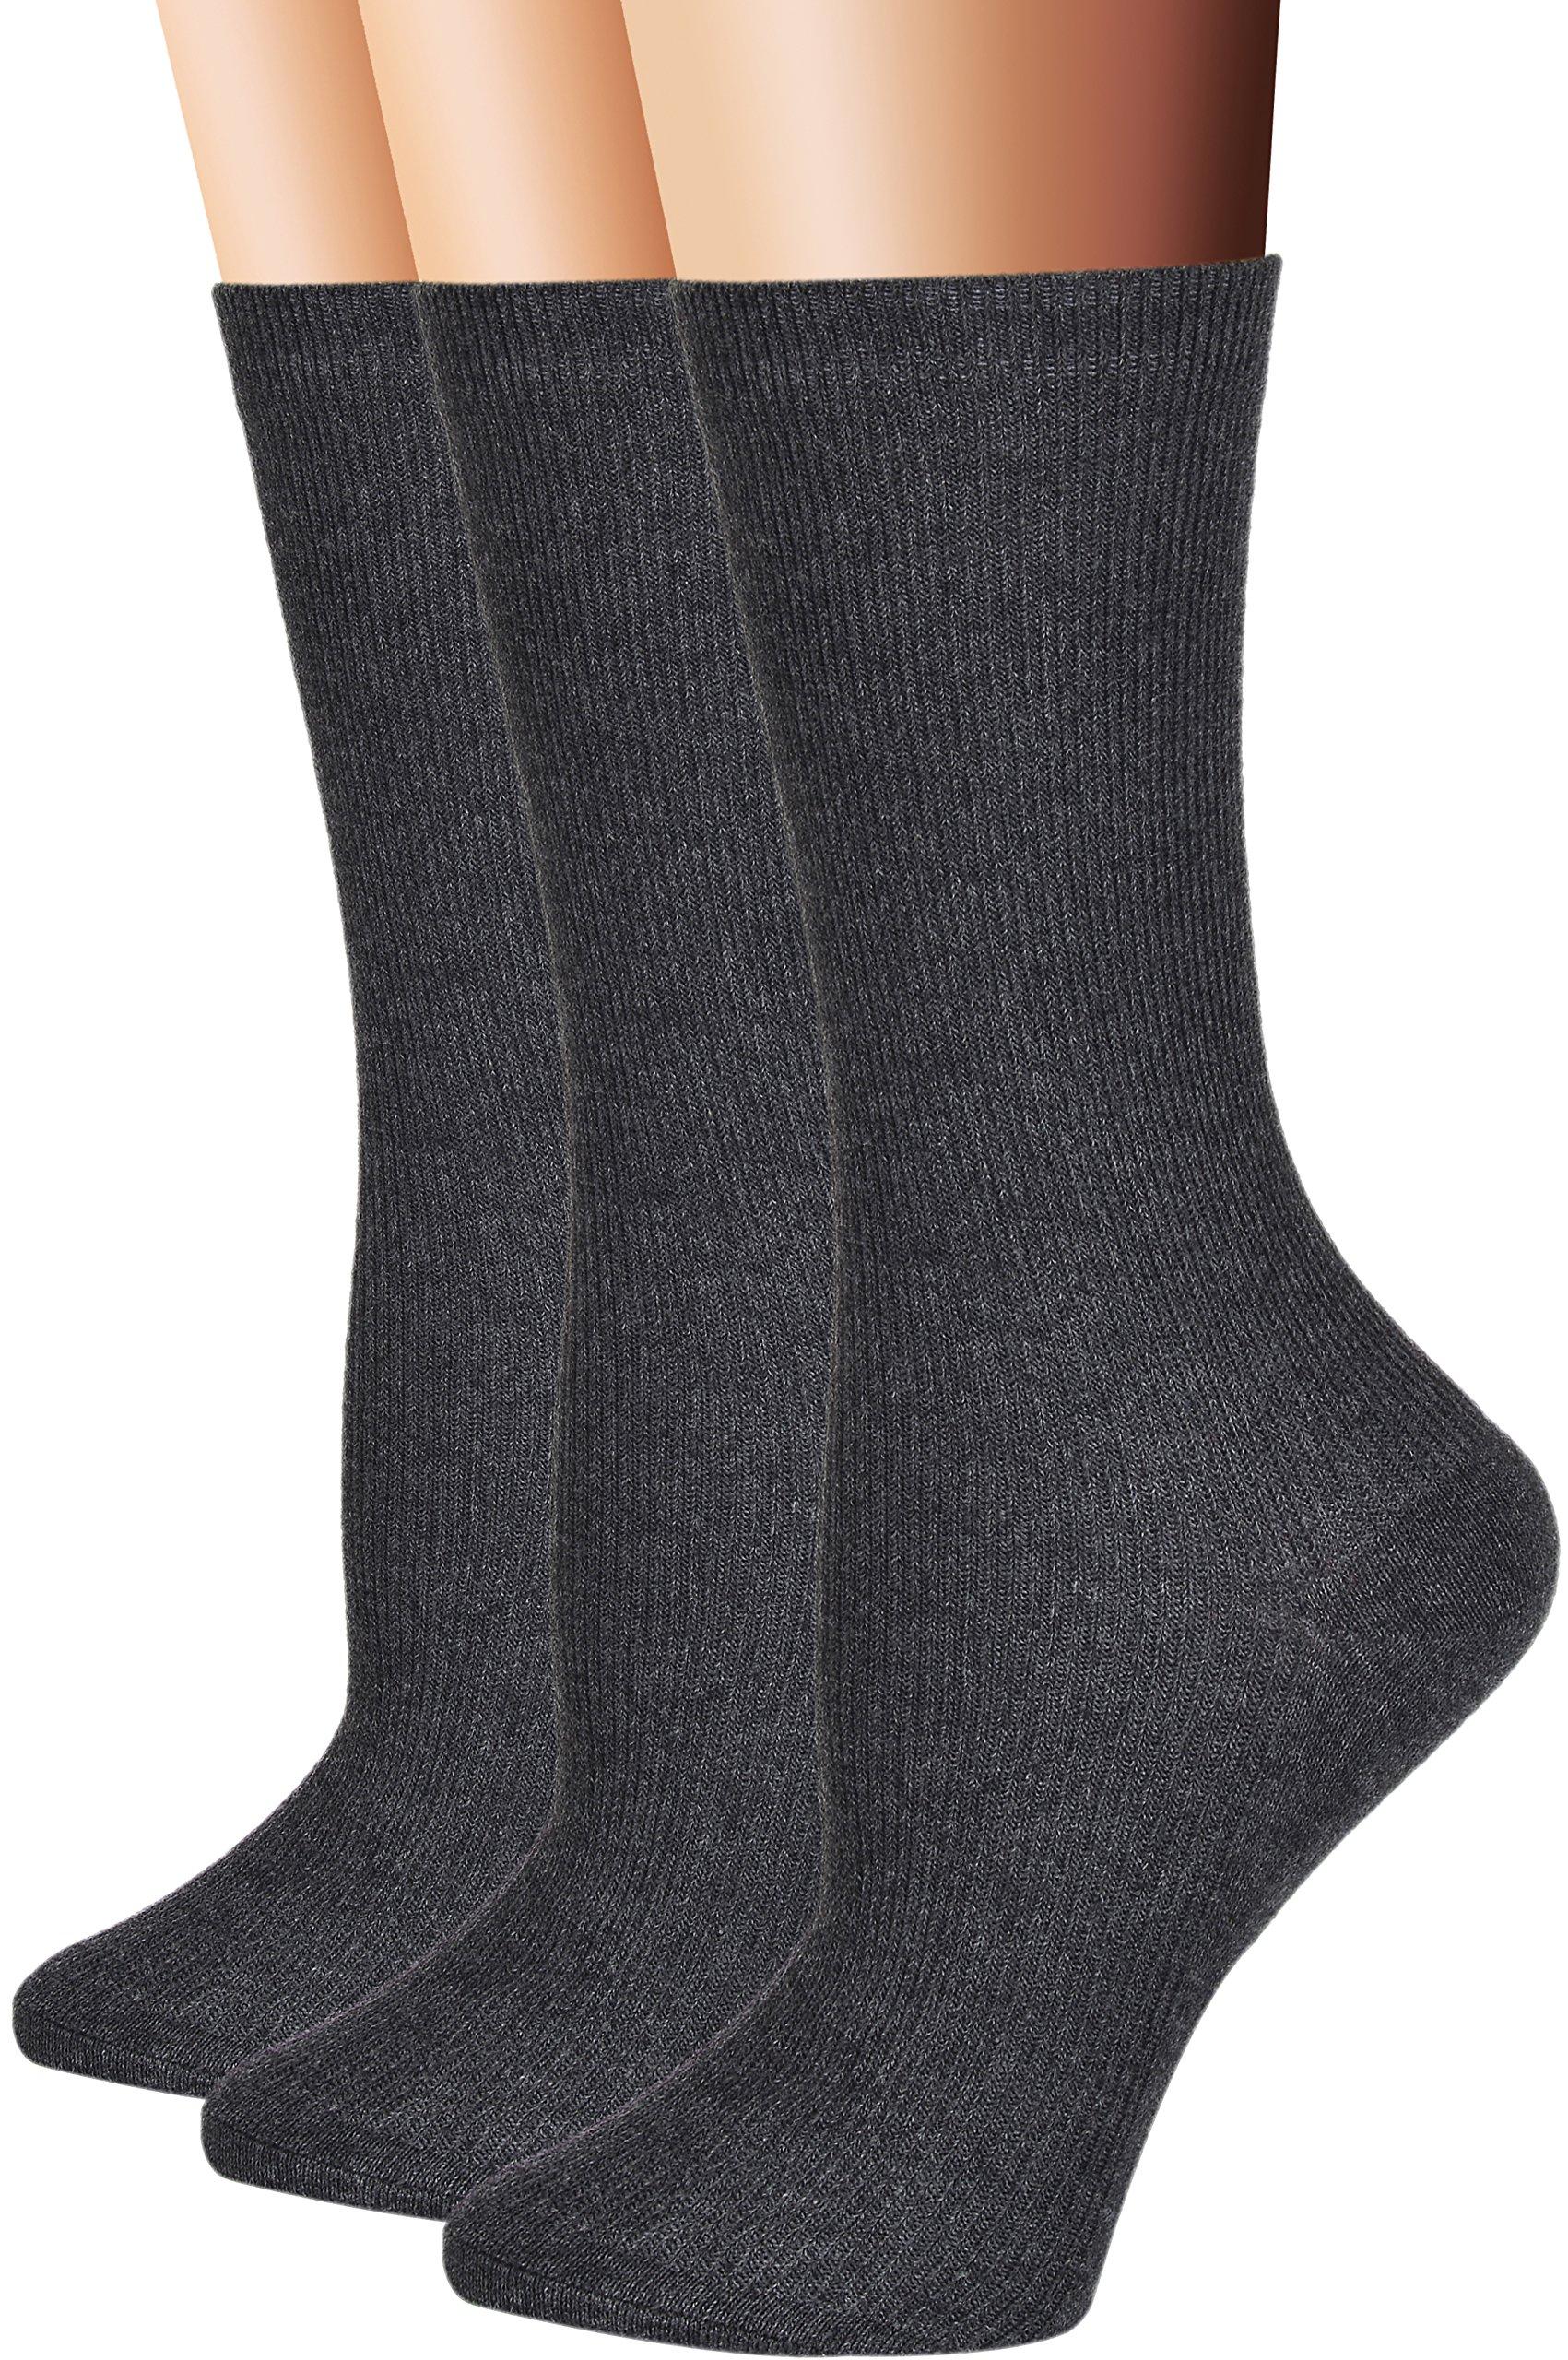 Flora&Fred Women's 3 Pair Pack Cotton Crew Socks Deep Gray